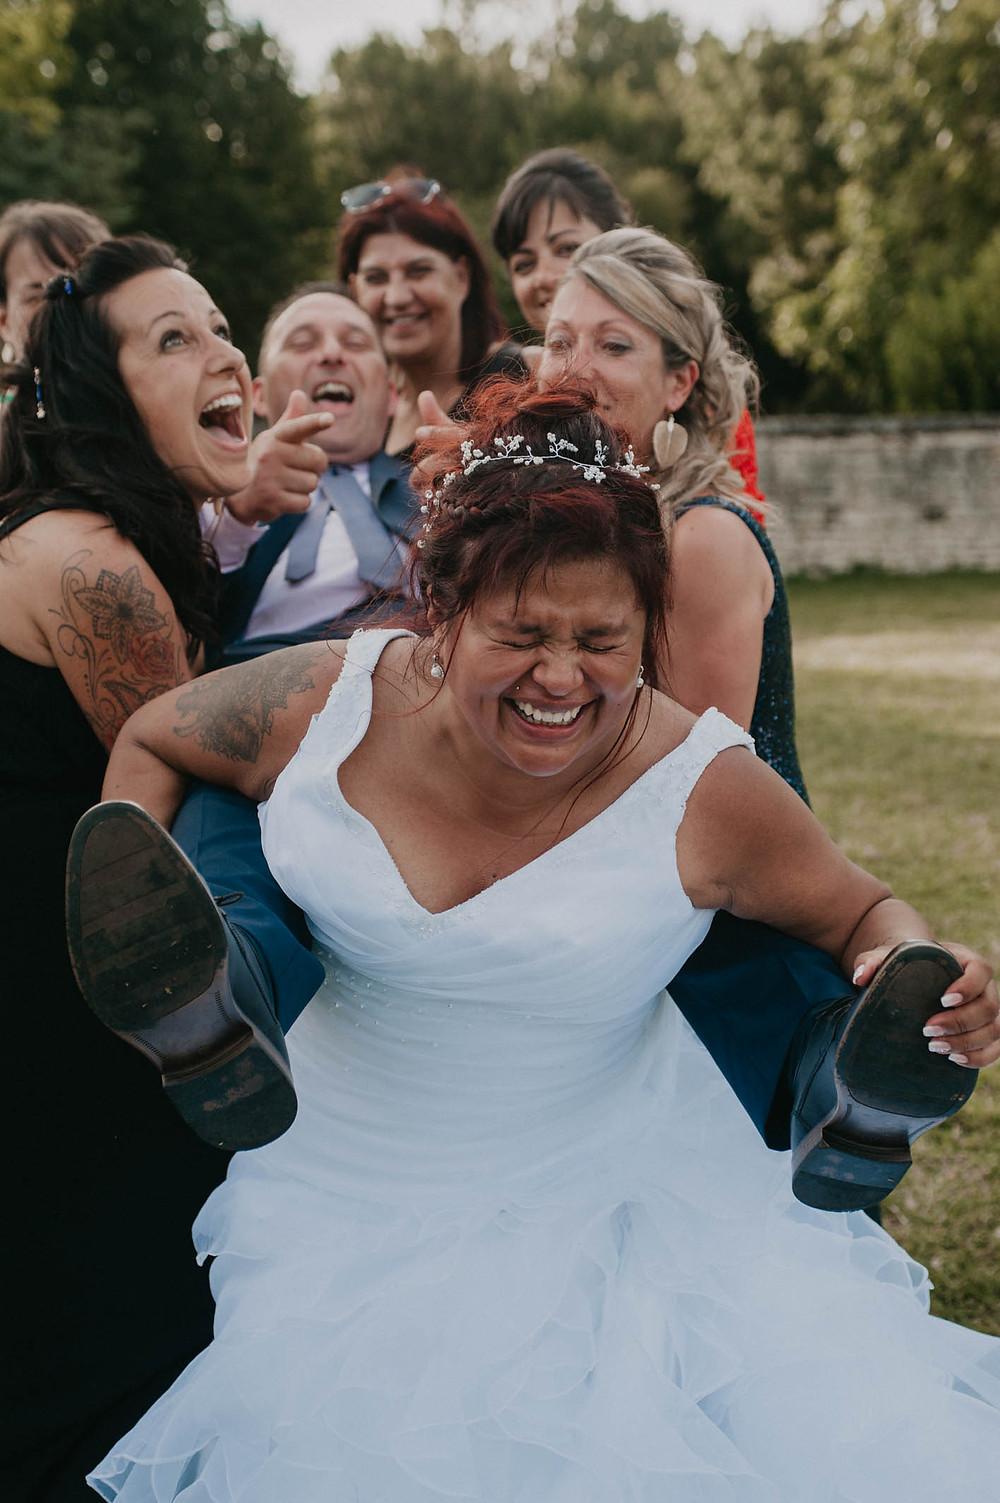 photographe-fun-rire-mariage-niort-domaine-de-la-gravette